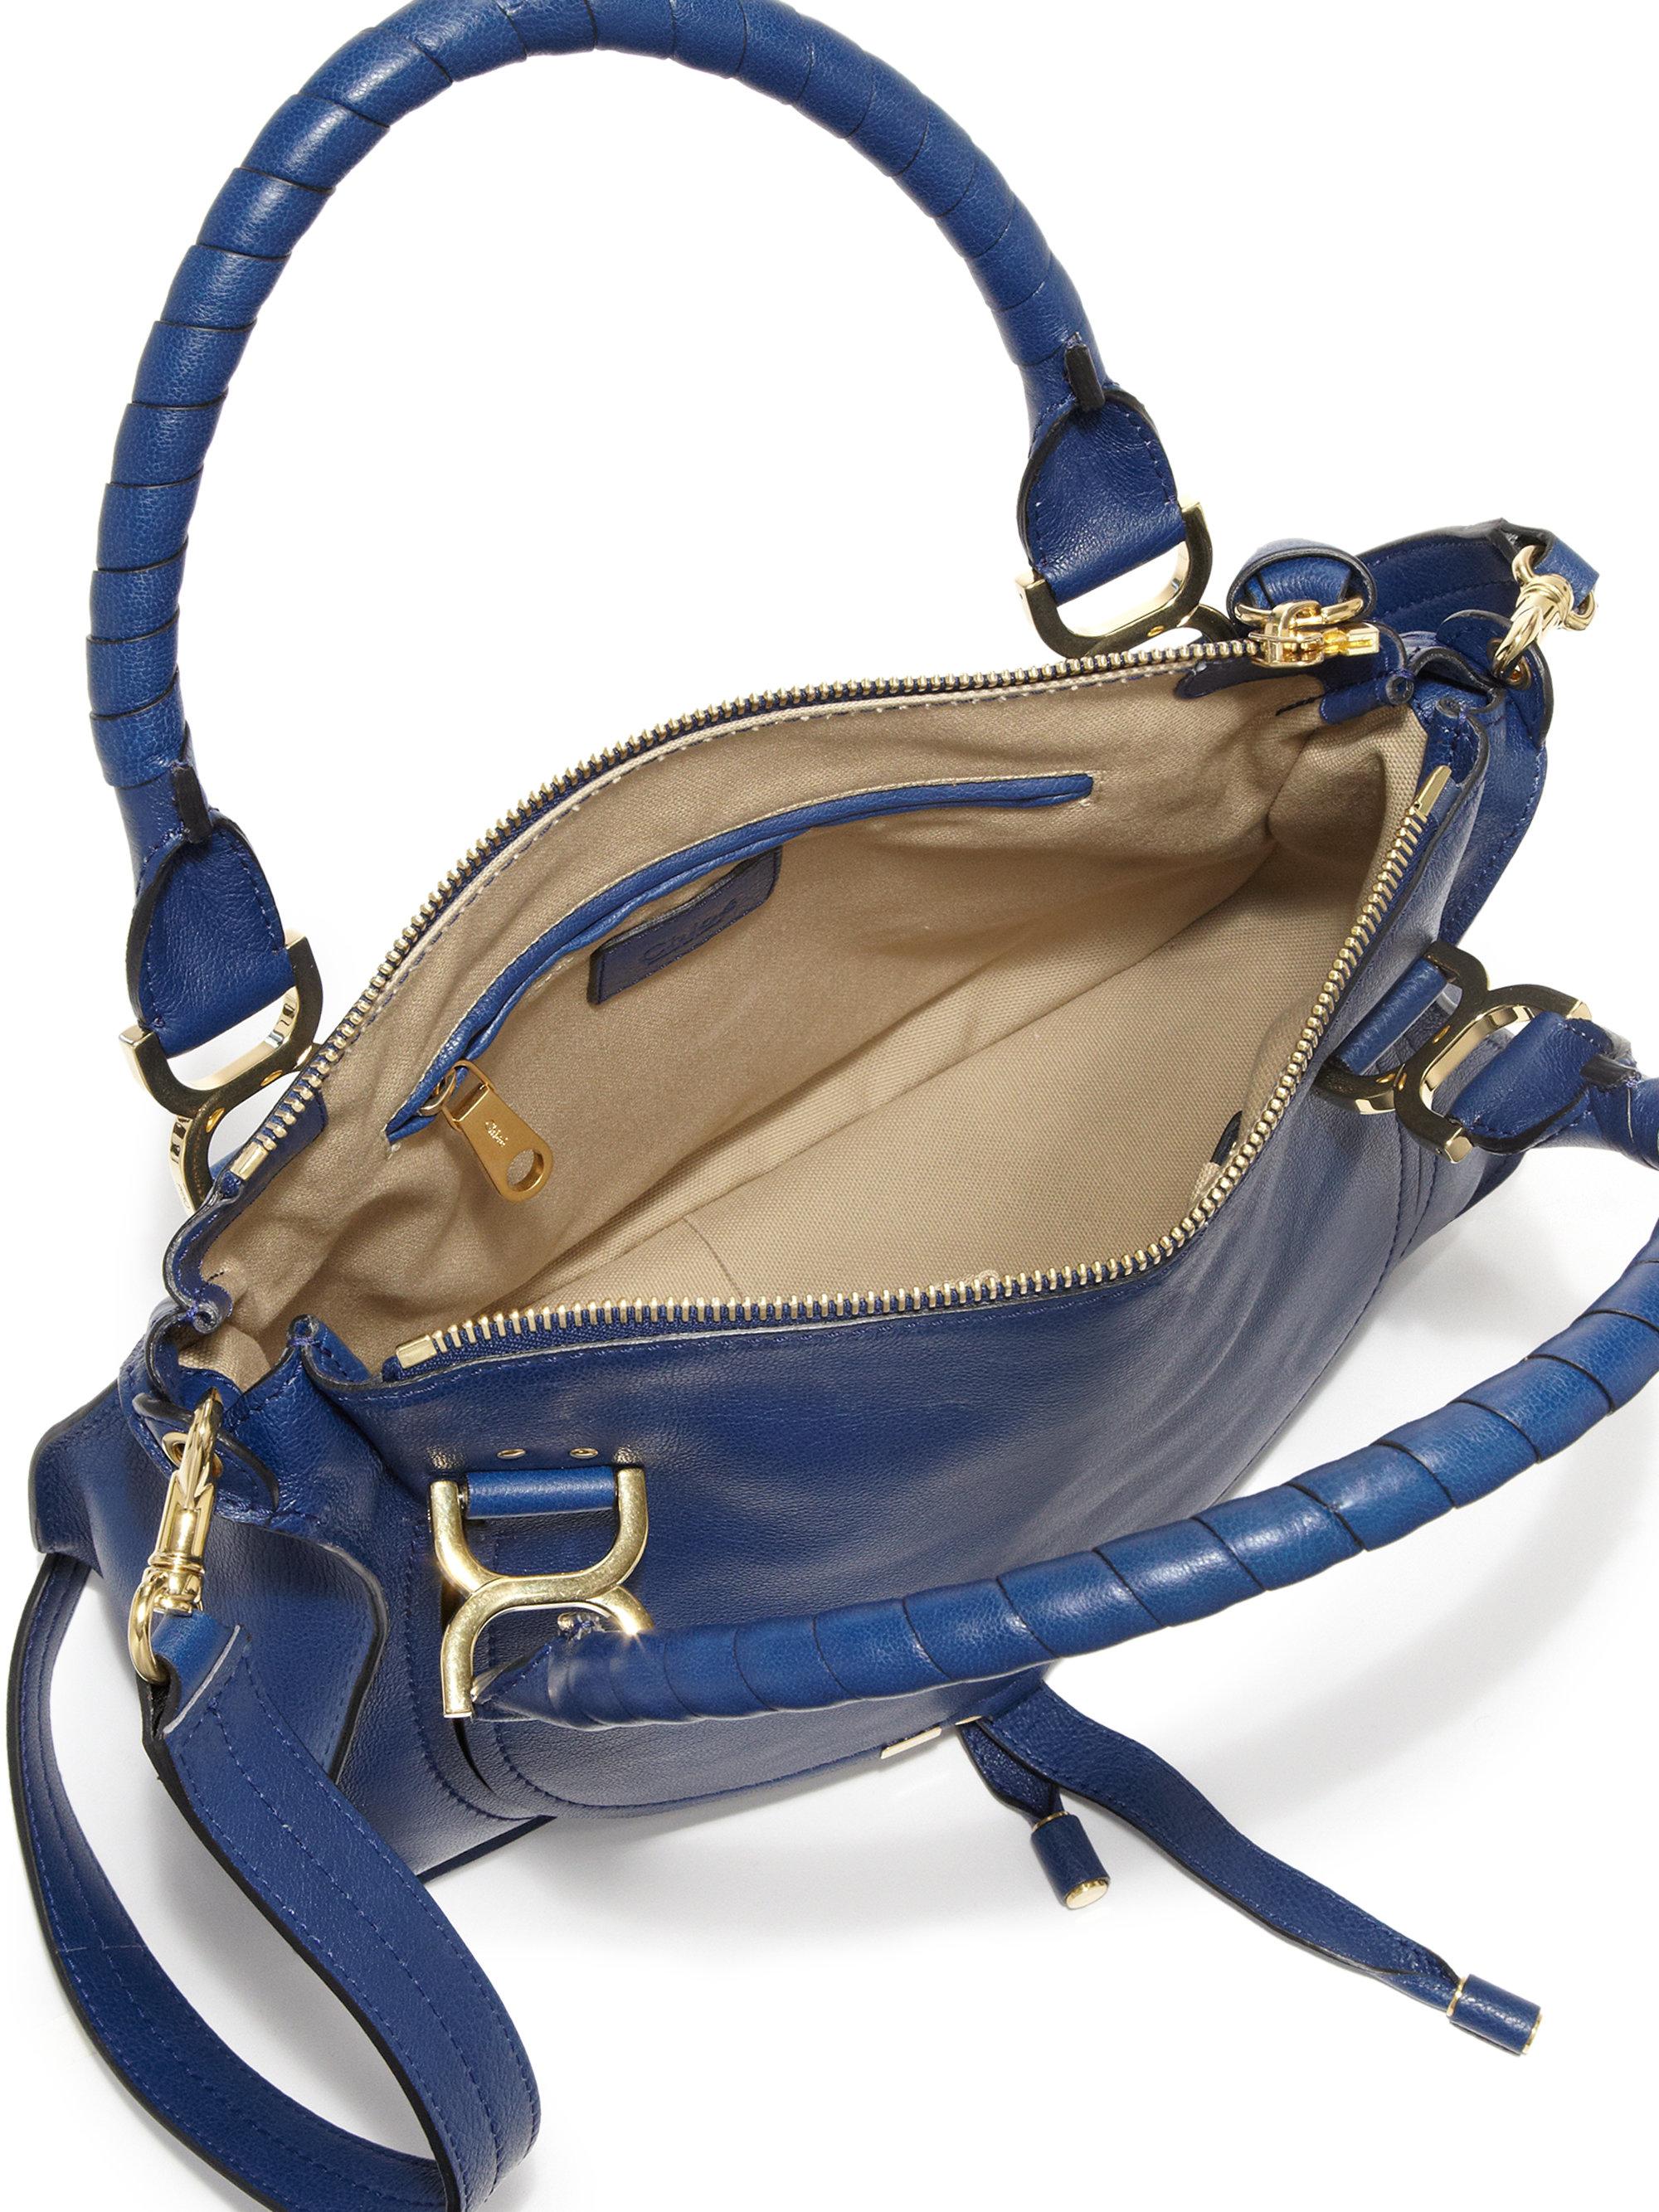 chloe medium leather satchel